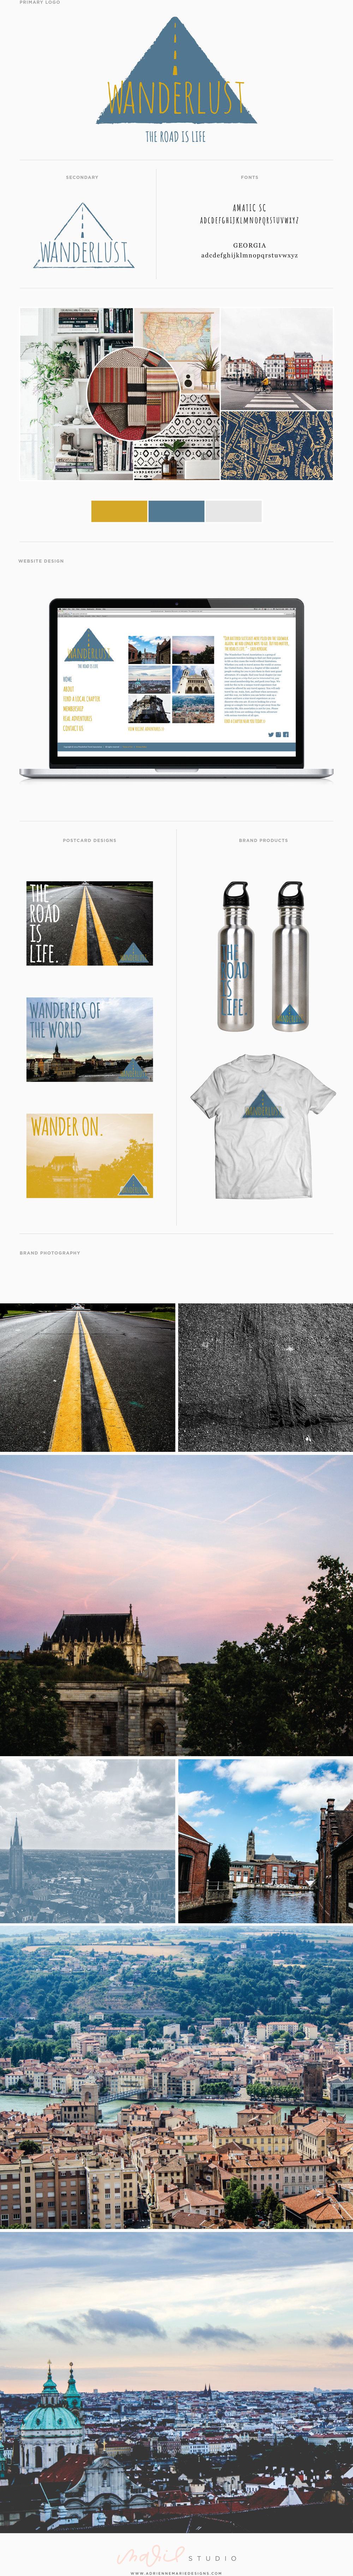 Wanderlust Brand Guide : Marie Studio